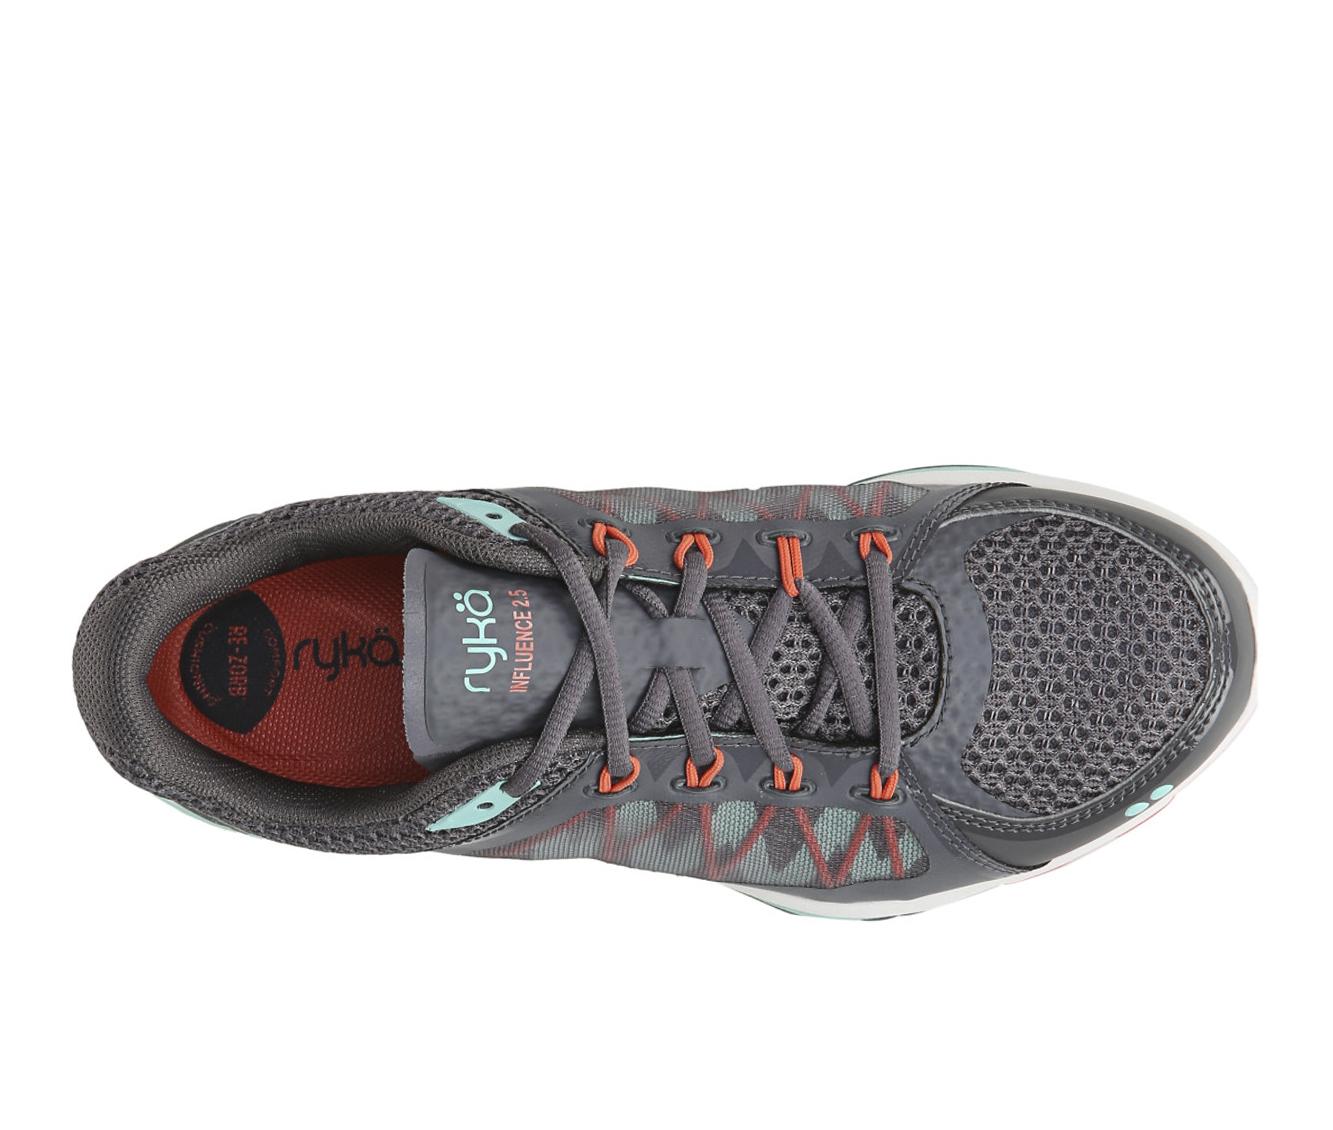 Women's Ryka Influence 2.5 Training Shoes